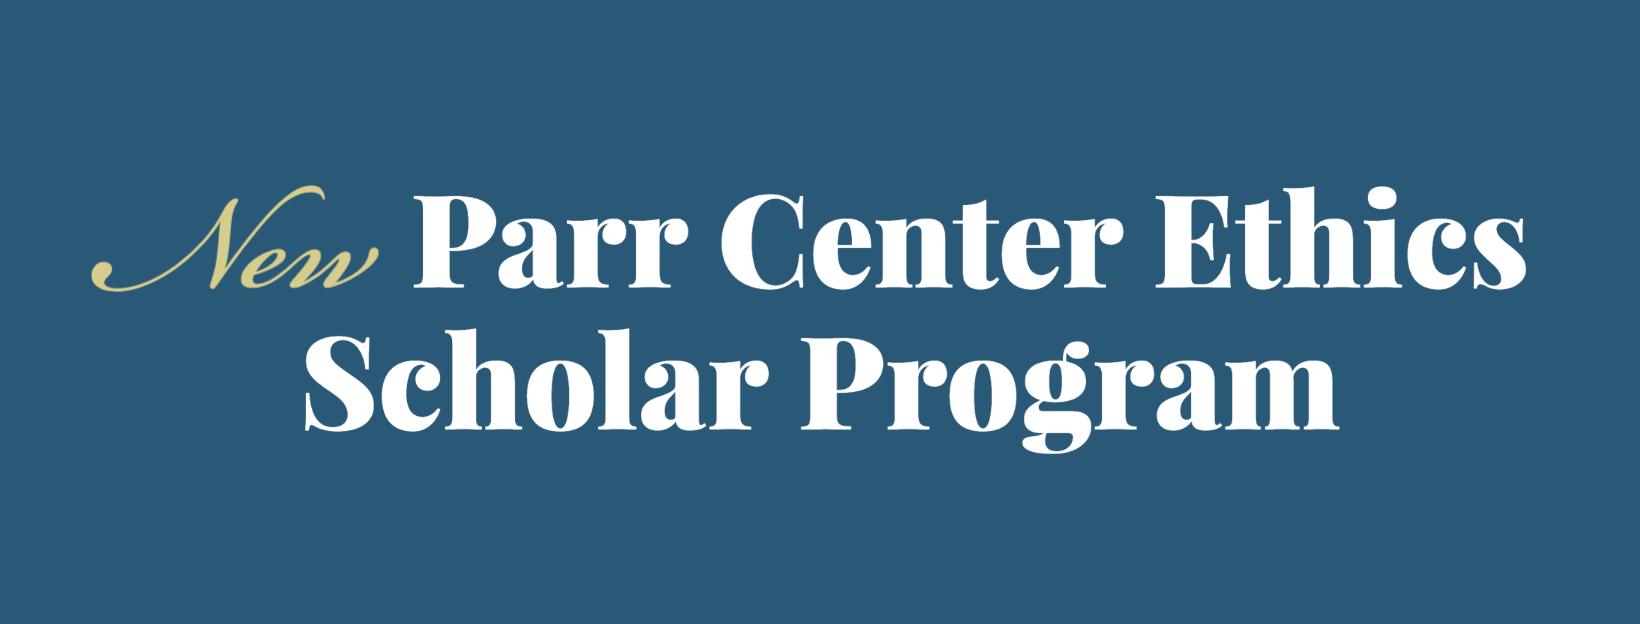 New Parr Center Ethics Scholar Program